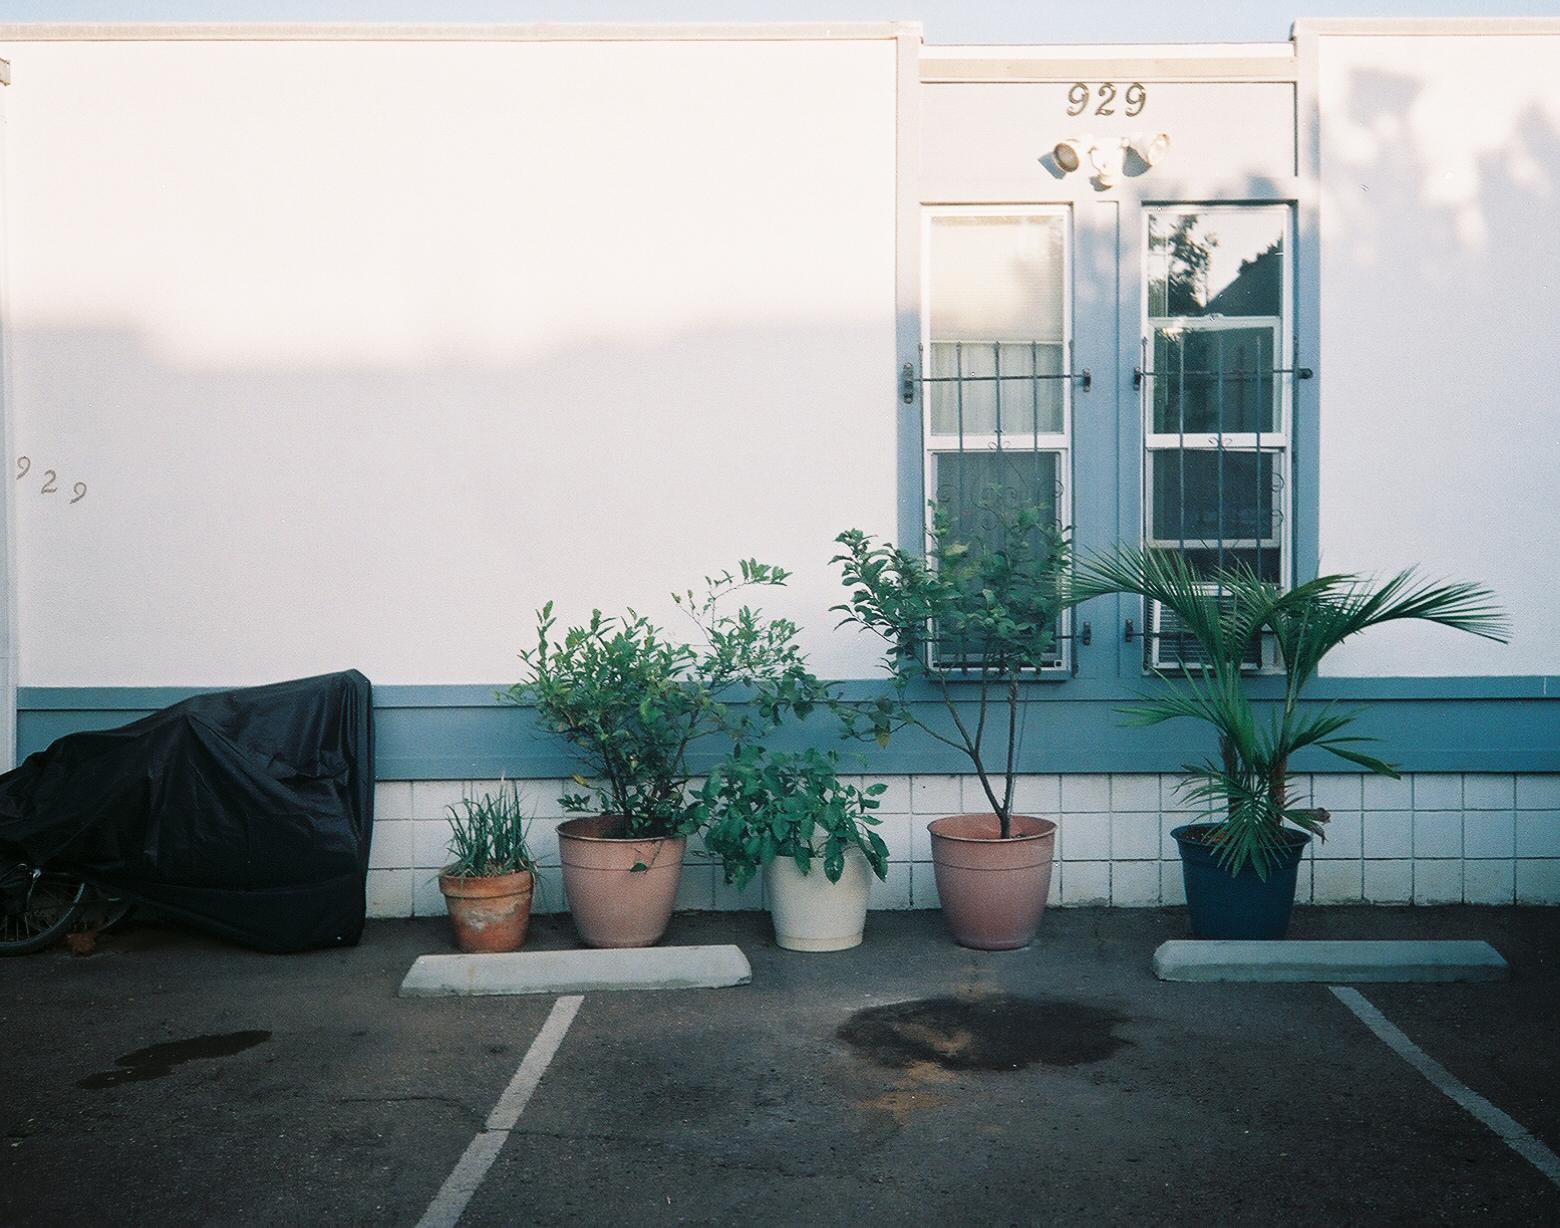 Street Film Photograph in Encinitas California